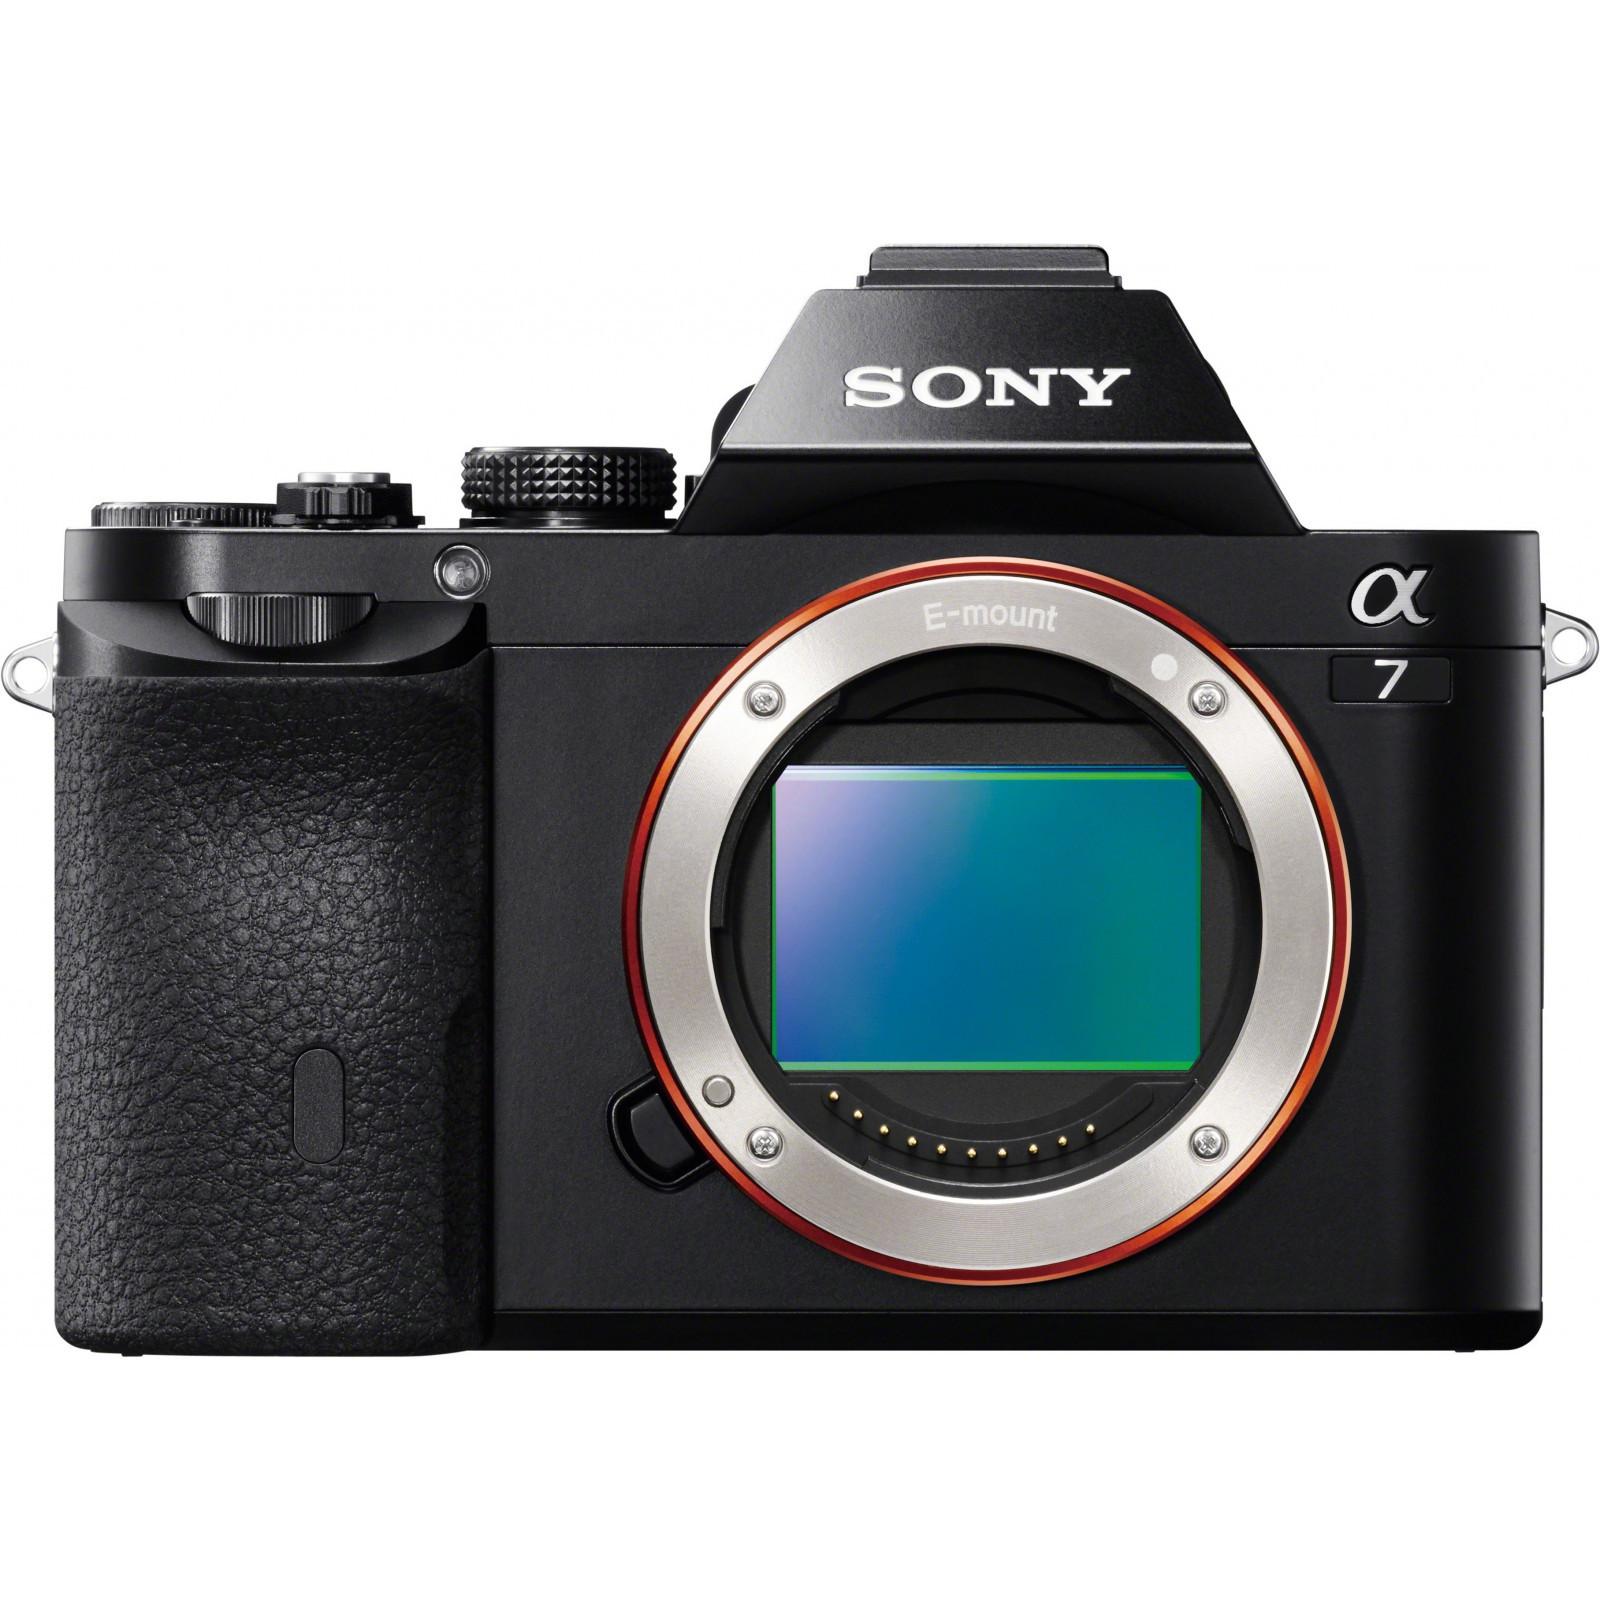 Фотоаппарат Sony Alpha 7 Body